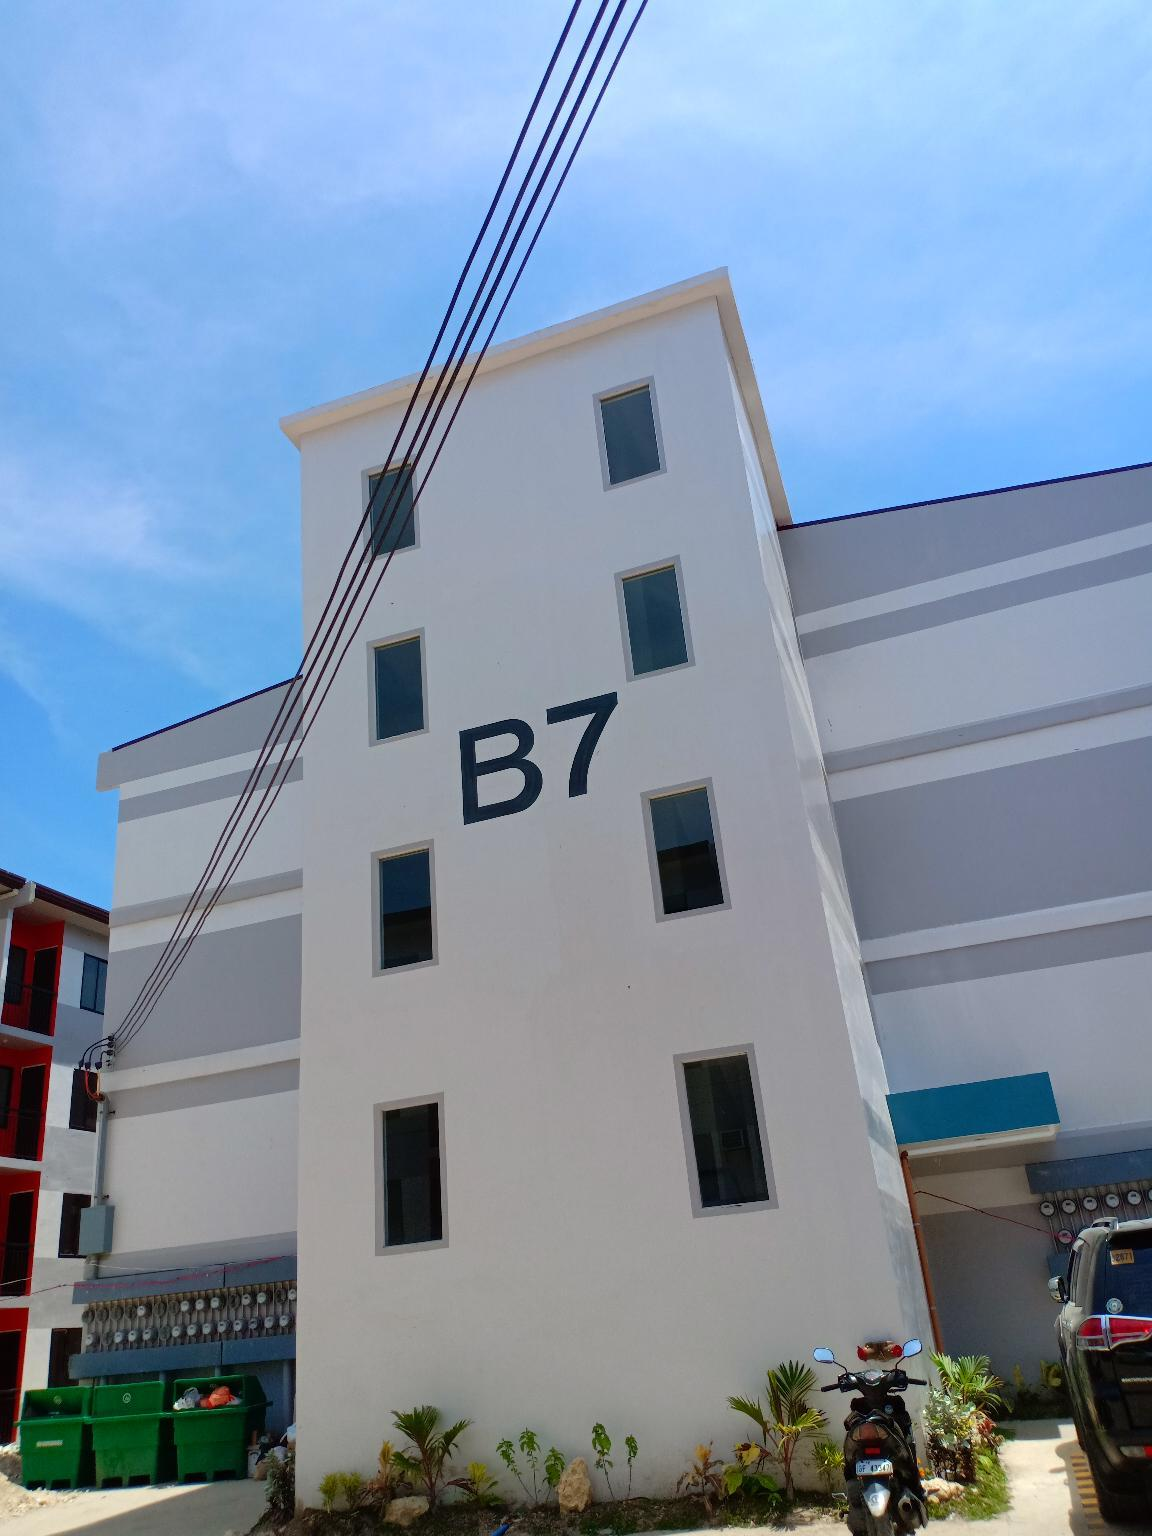 Studio Unit At Hernan Cortes Street